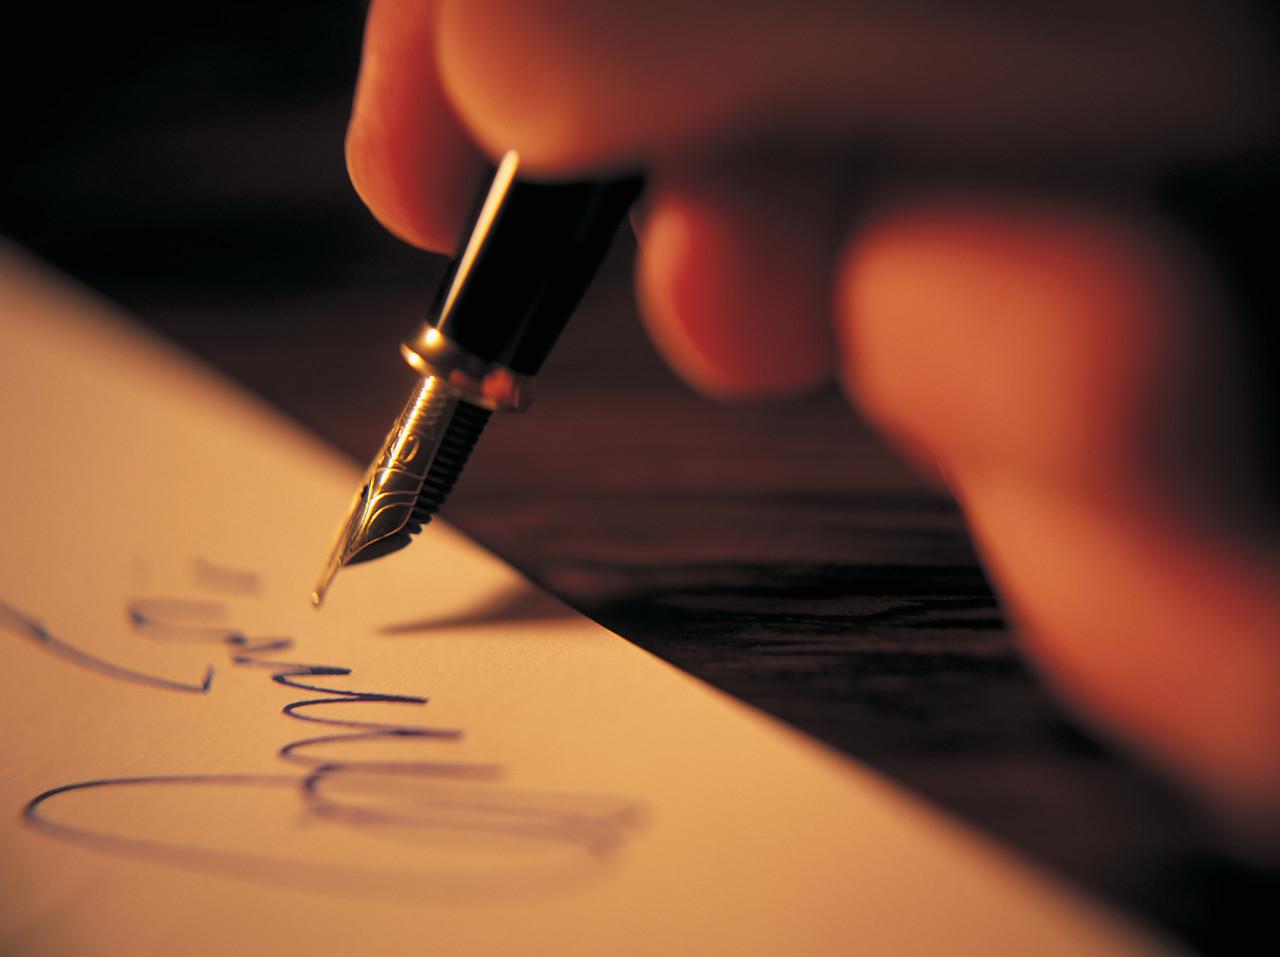 writing of rizal Rizal's life work's and writings rizals life works and writings rizals  summary of rizal of all public 6 the summary of rizal life works and writing chapter 16 free  wwwstudymodecom.